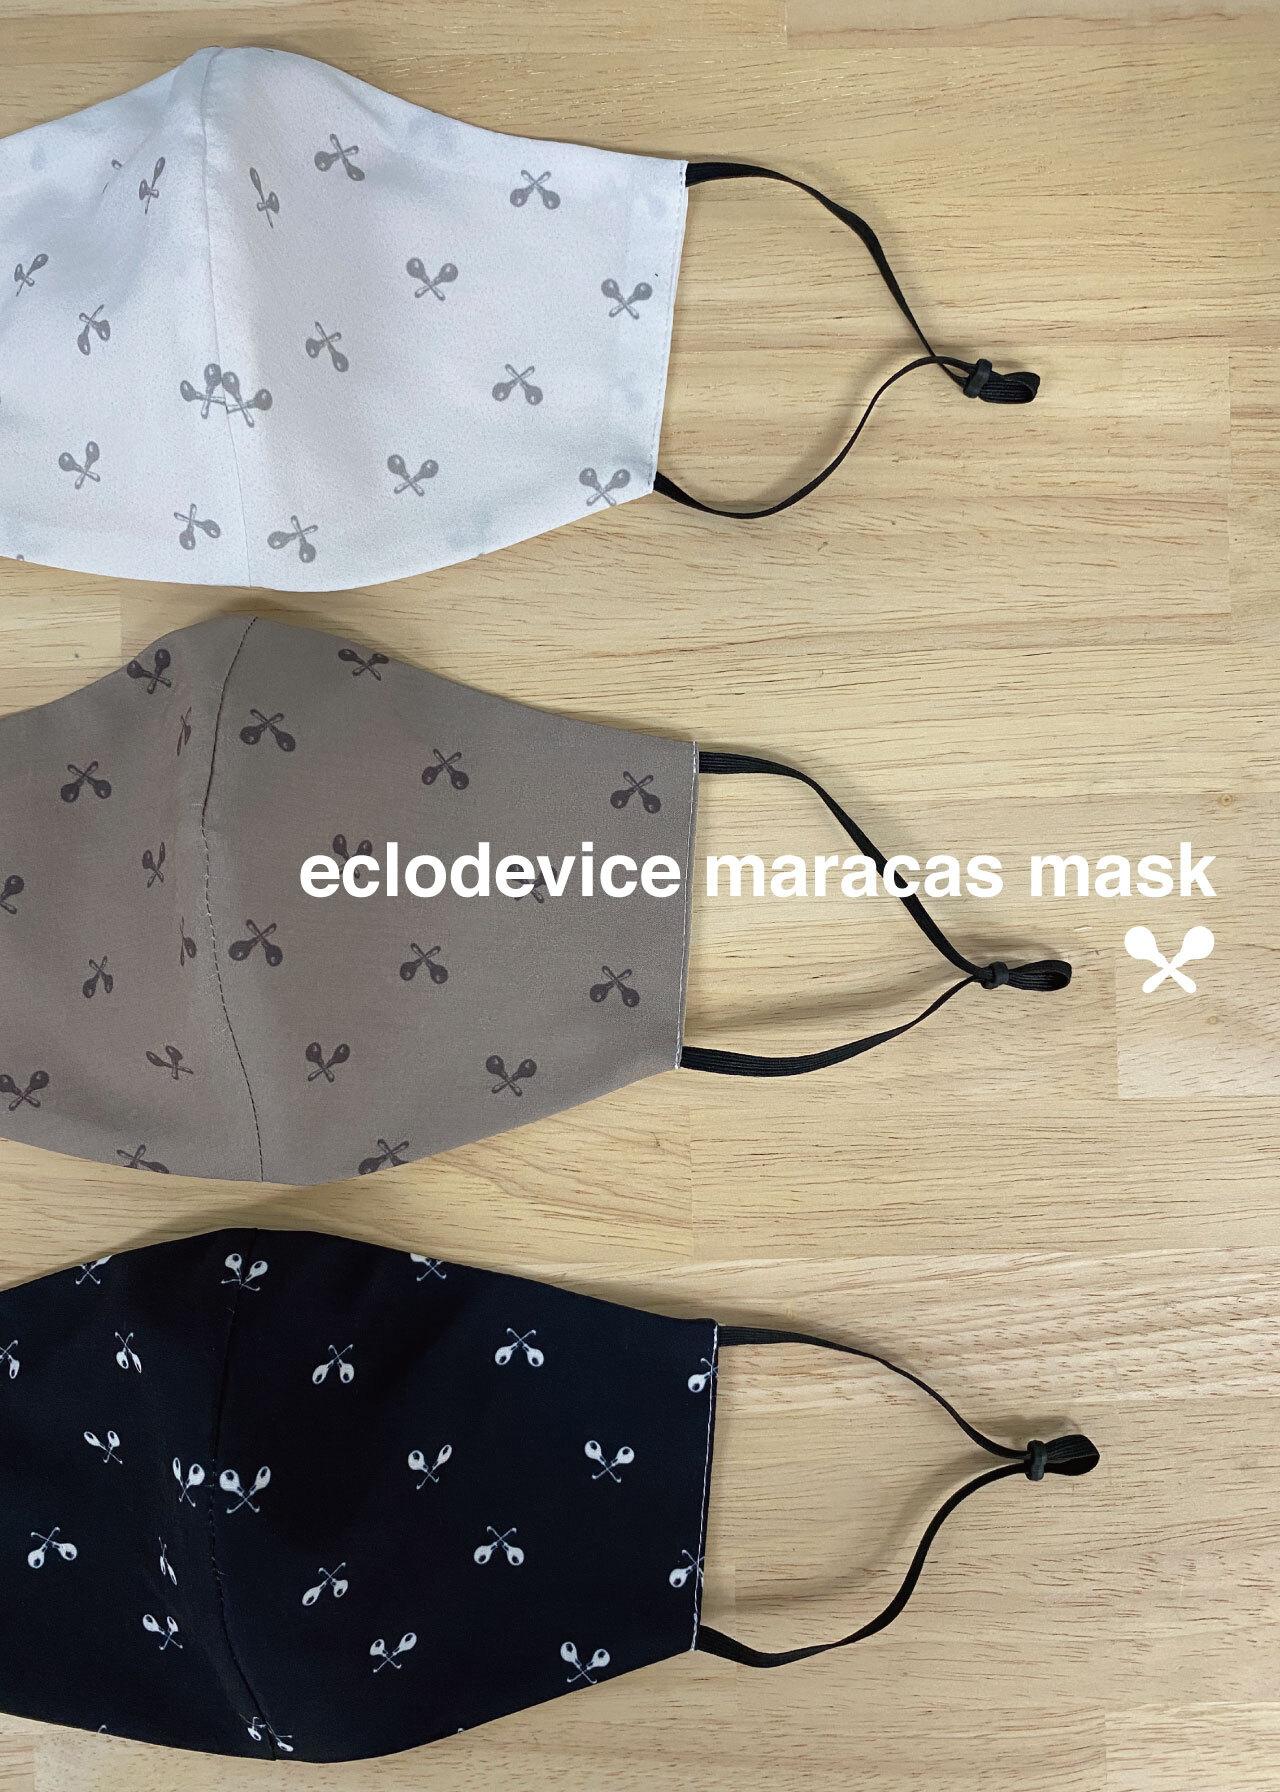 eclodevice maracas mask